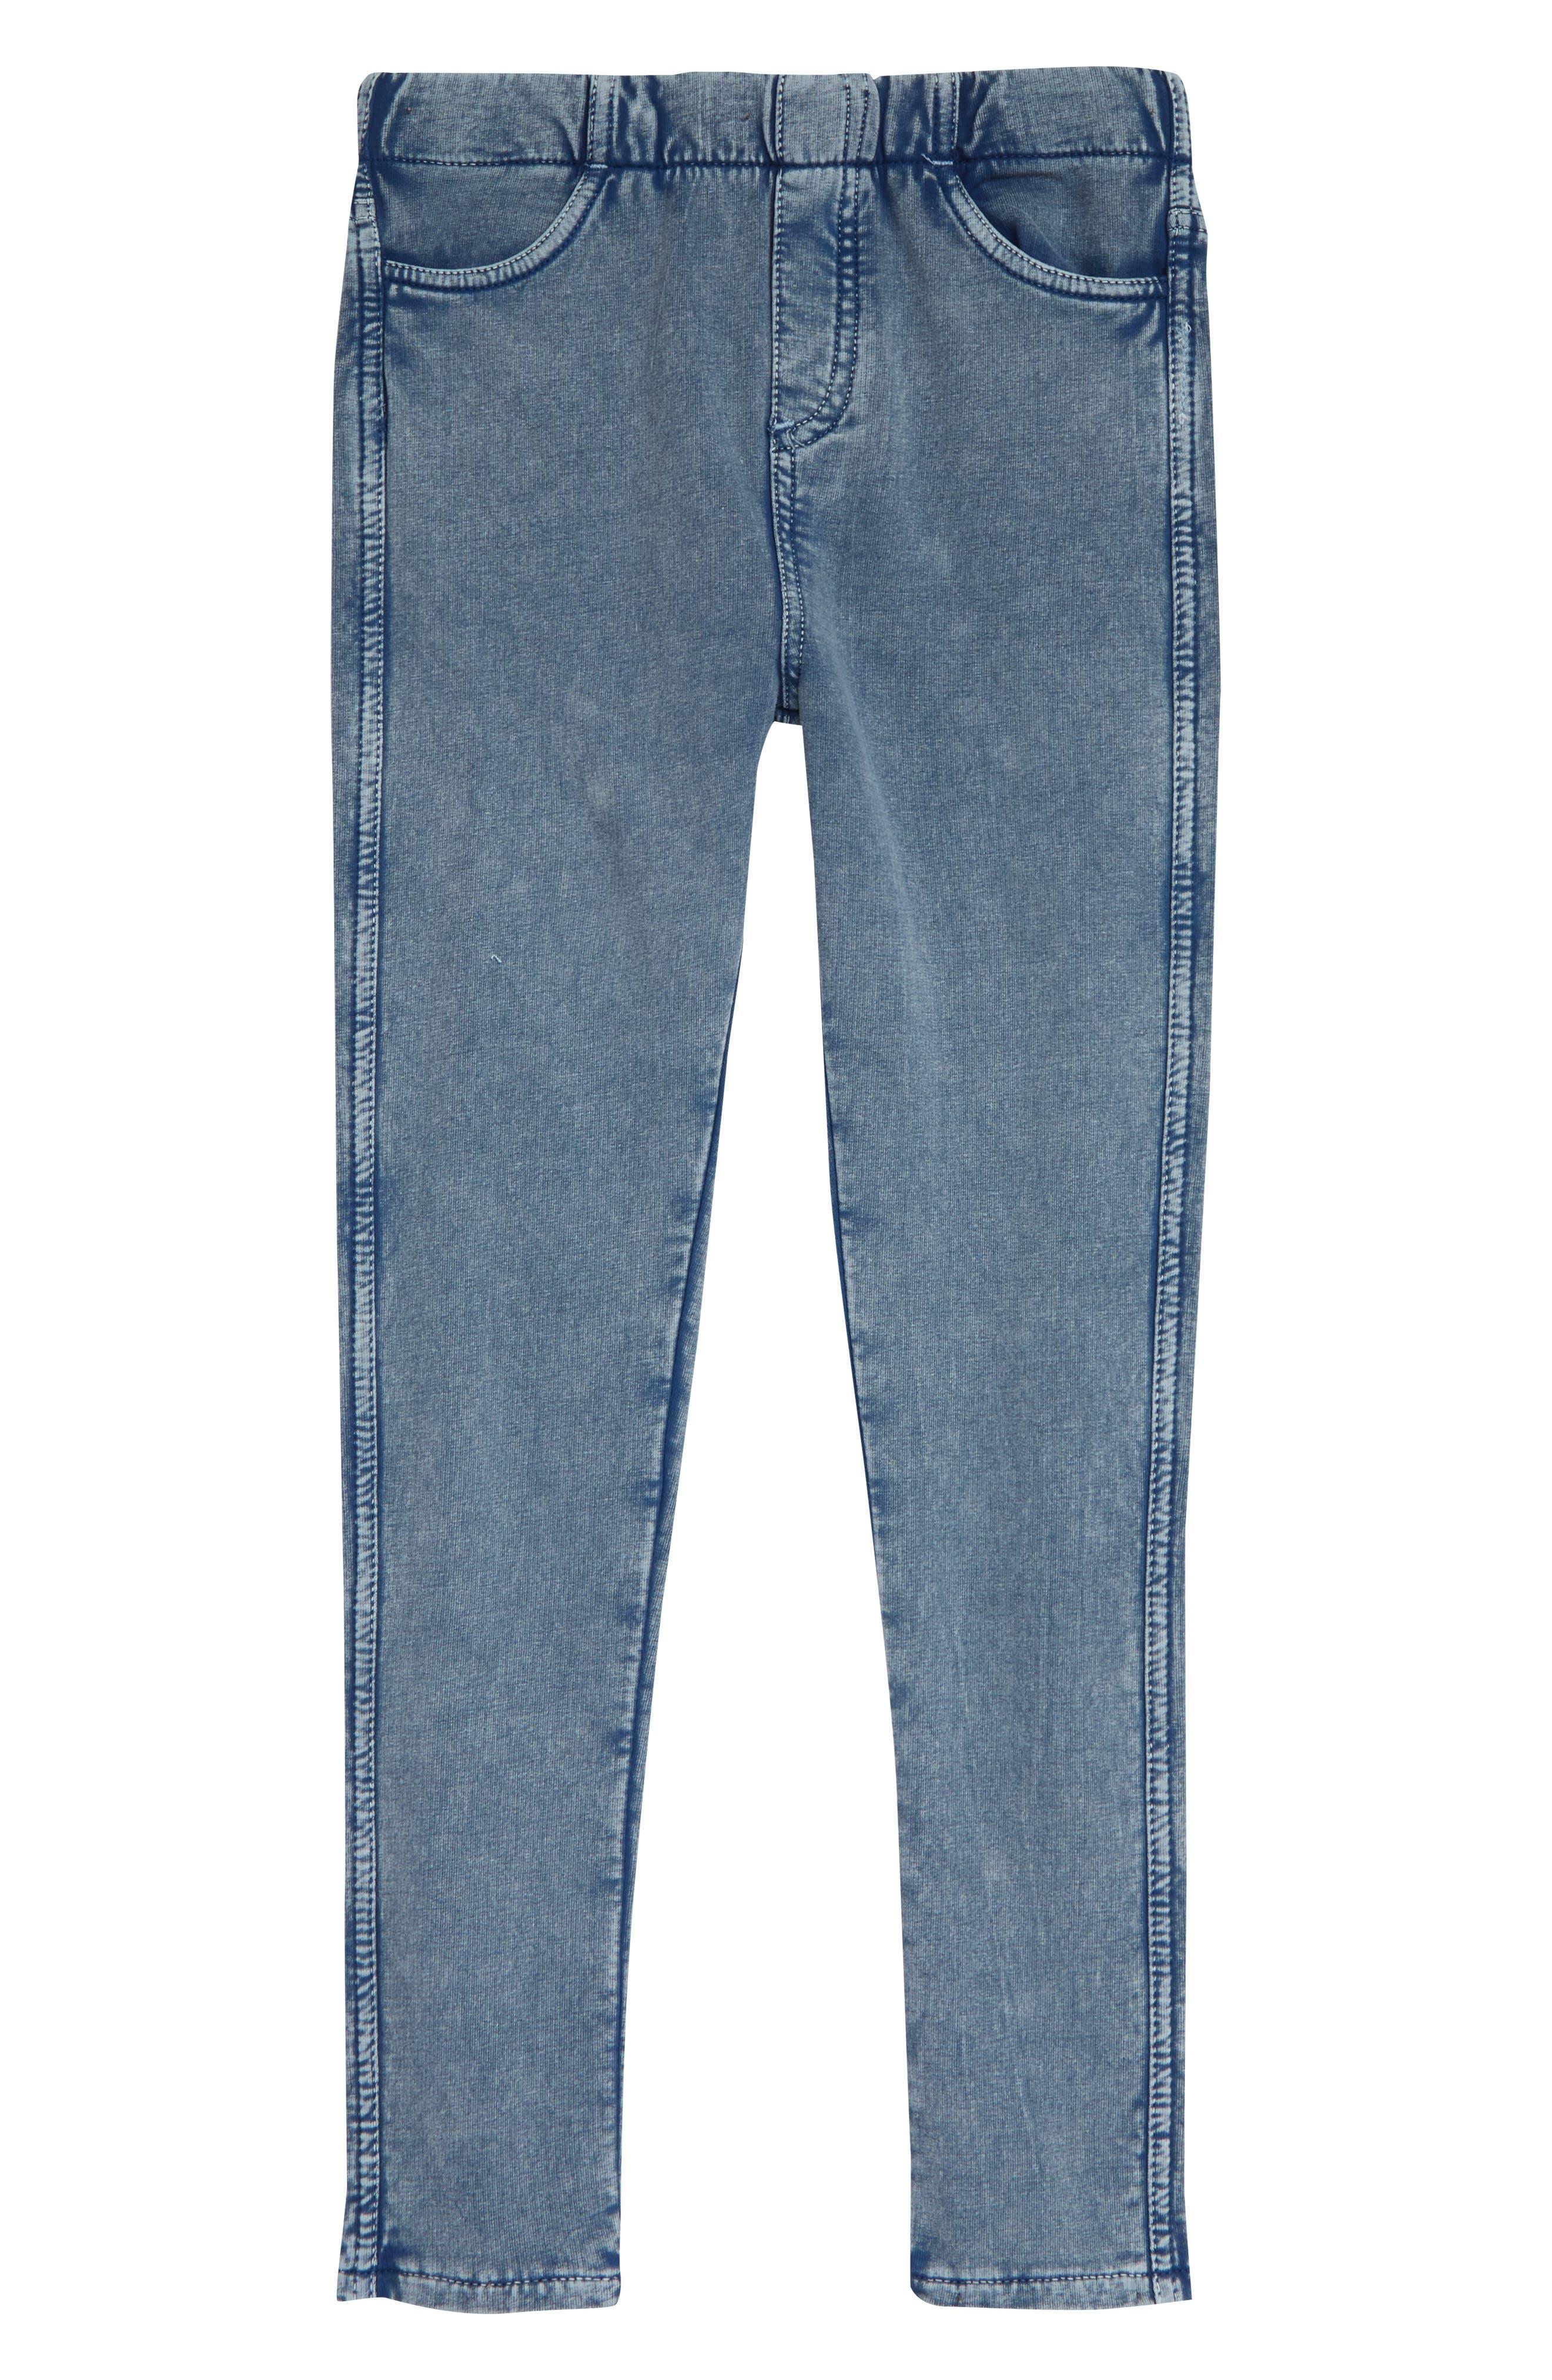 Essentials Girls Skinny Stretch Jeans